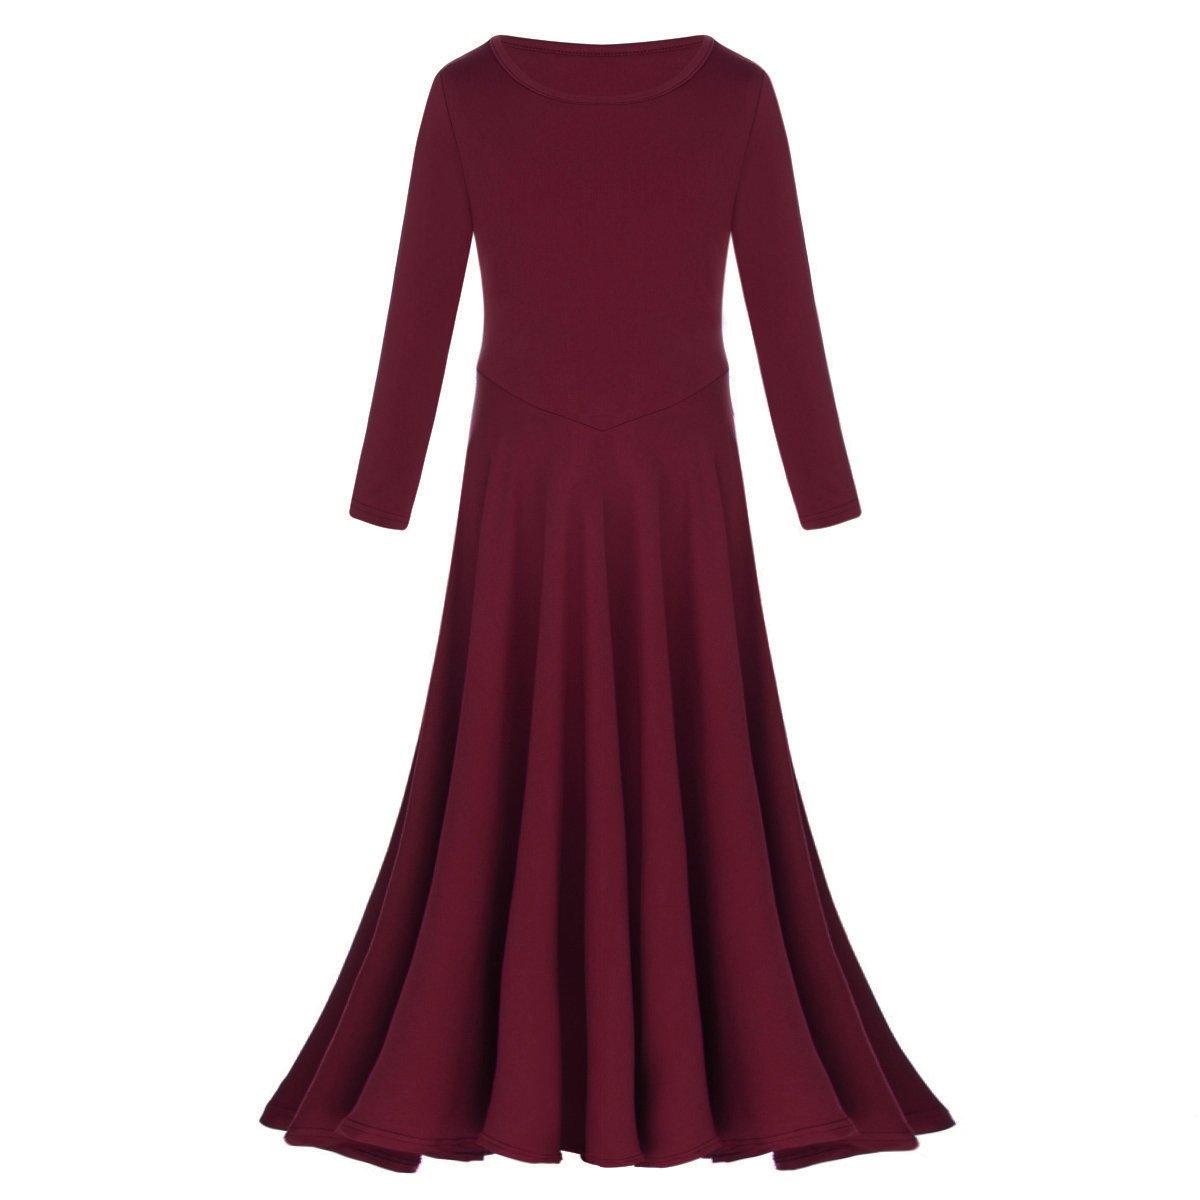 IBTOM CASTLE Womens Liturgical Praise Lyrical Dance Dress Loose Fit Full Length Long Sleeve Worship Costume Ballet